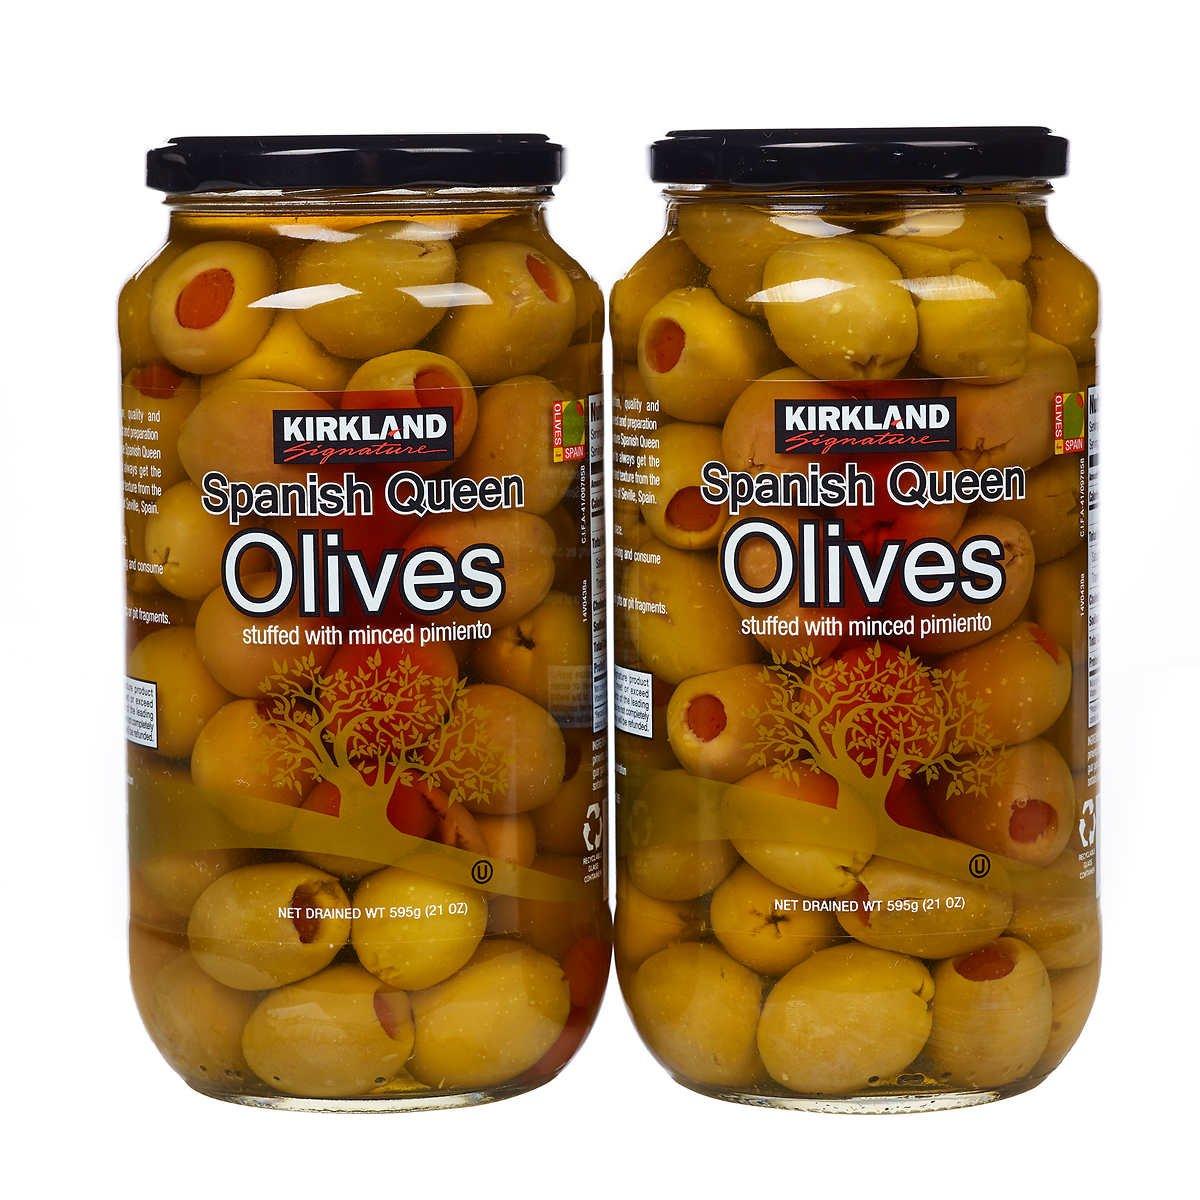 Kirkland Signature Pimento Stuffed Spanish Queen Olives 21 oz. Jars x 2 Jars